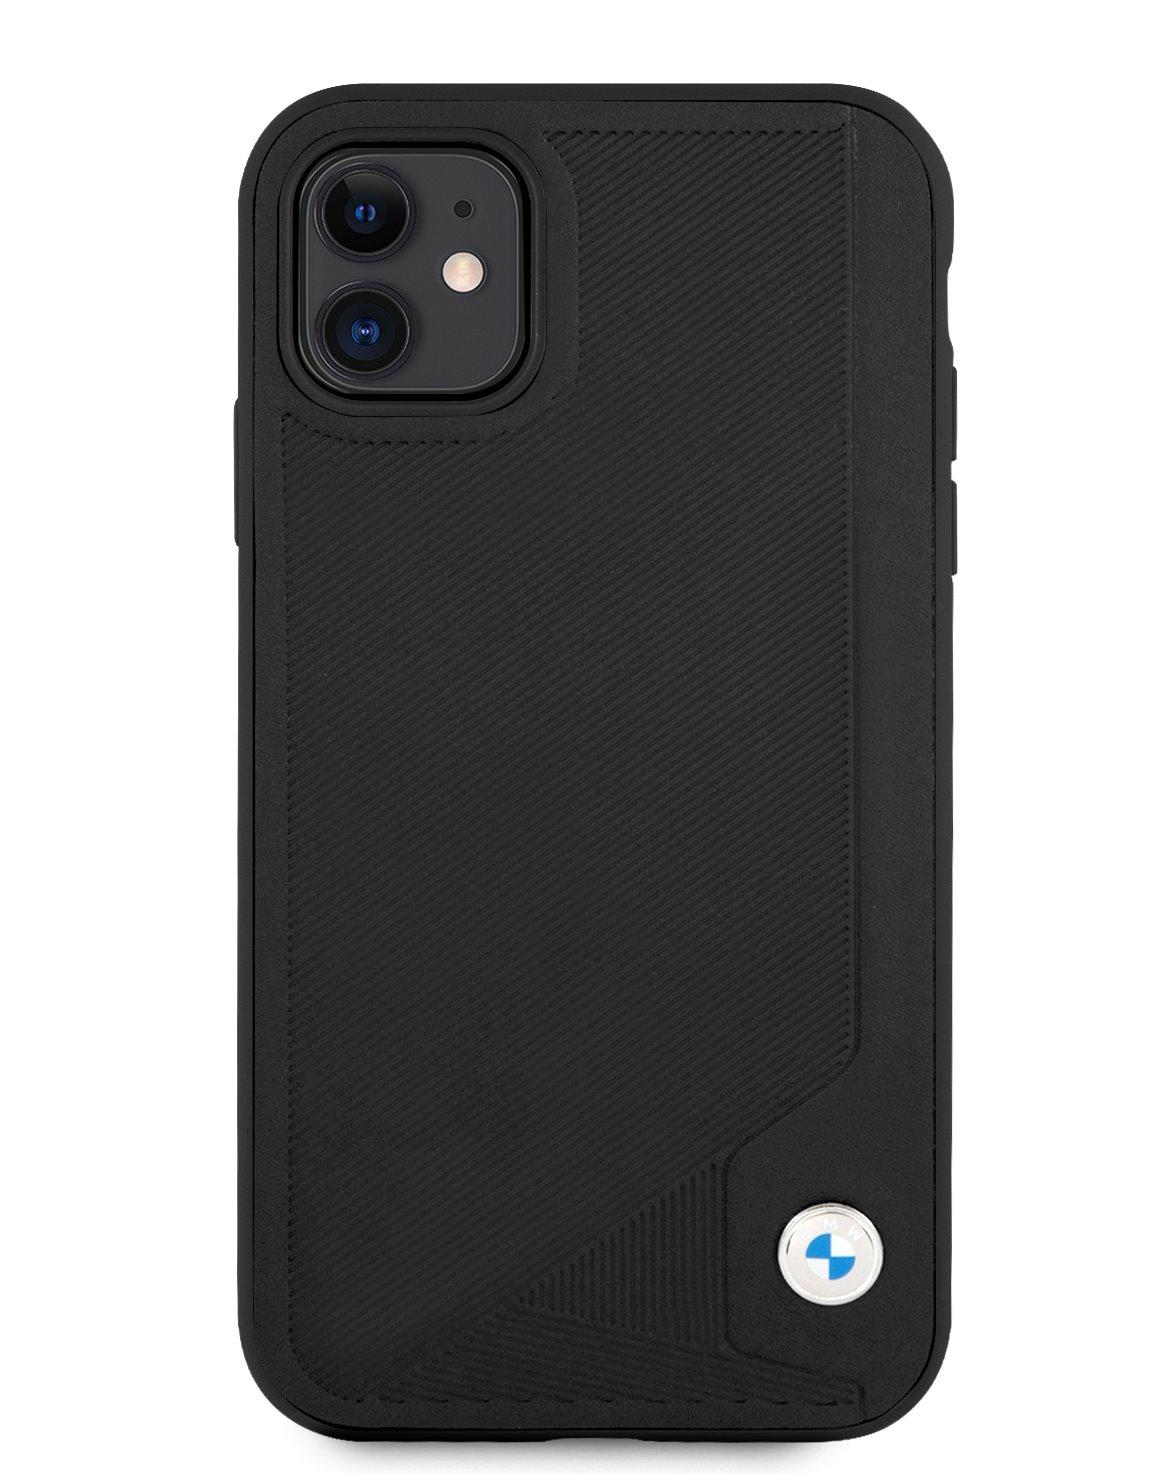 BMHCN61RCDPK BMW Signature Leather Debossed Stripes Kryt pro iPhone 11 Black 3666339011741